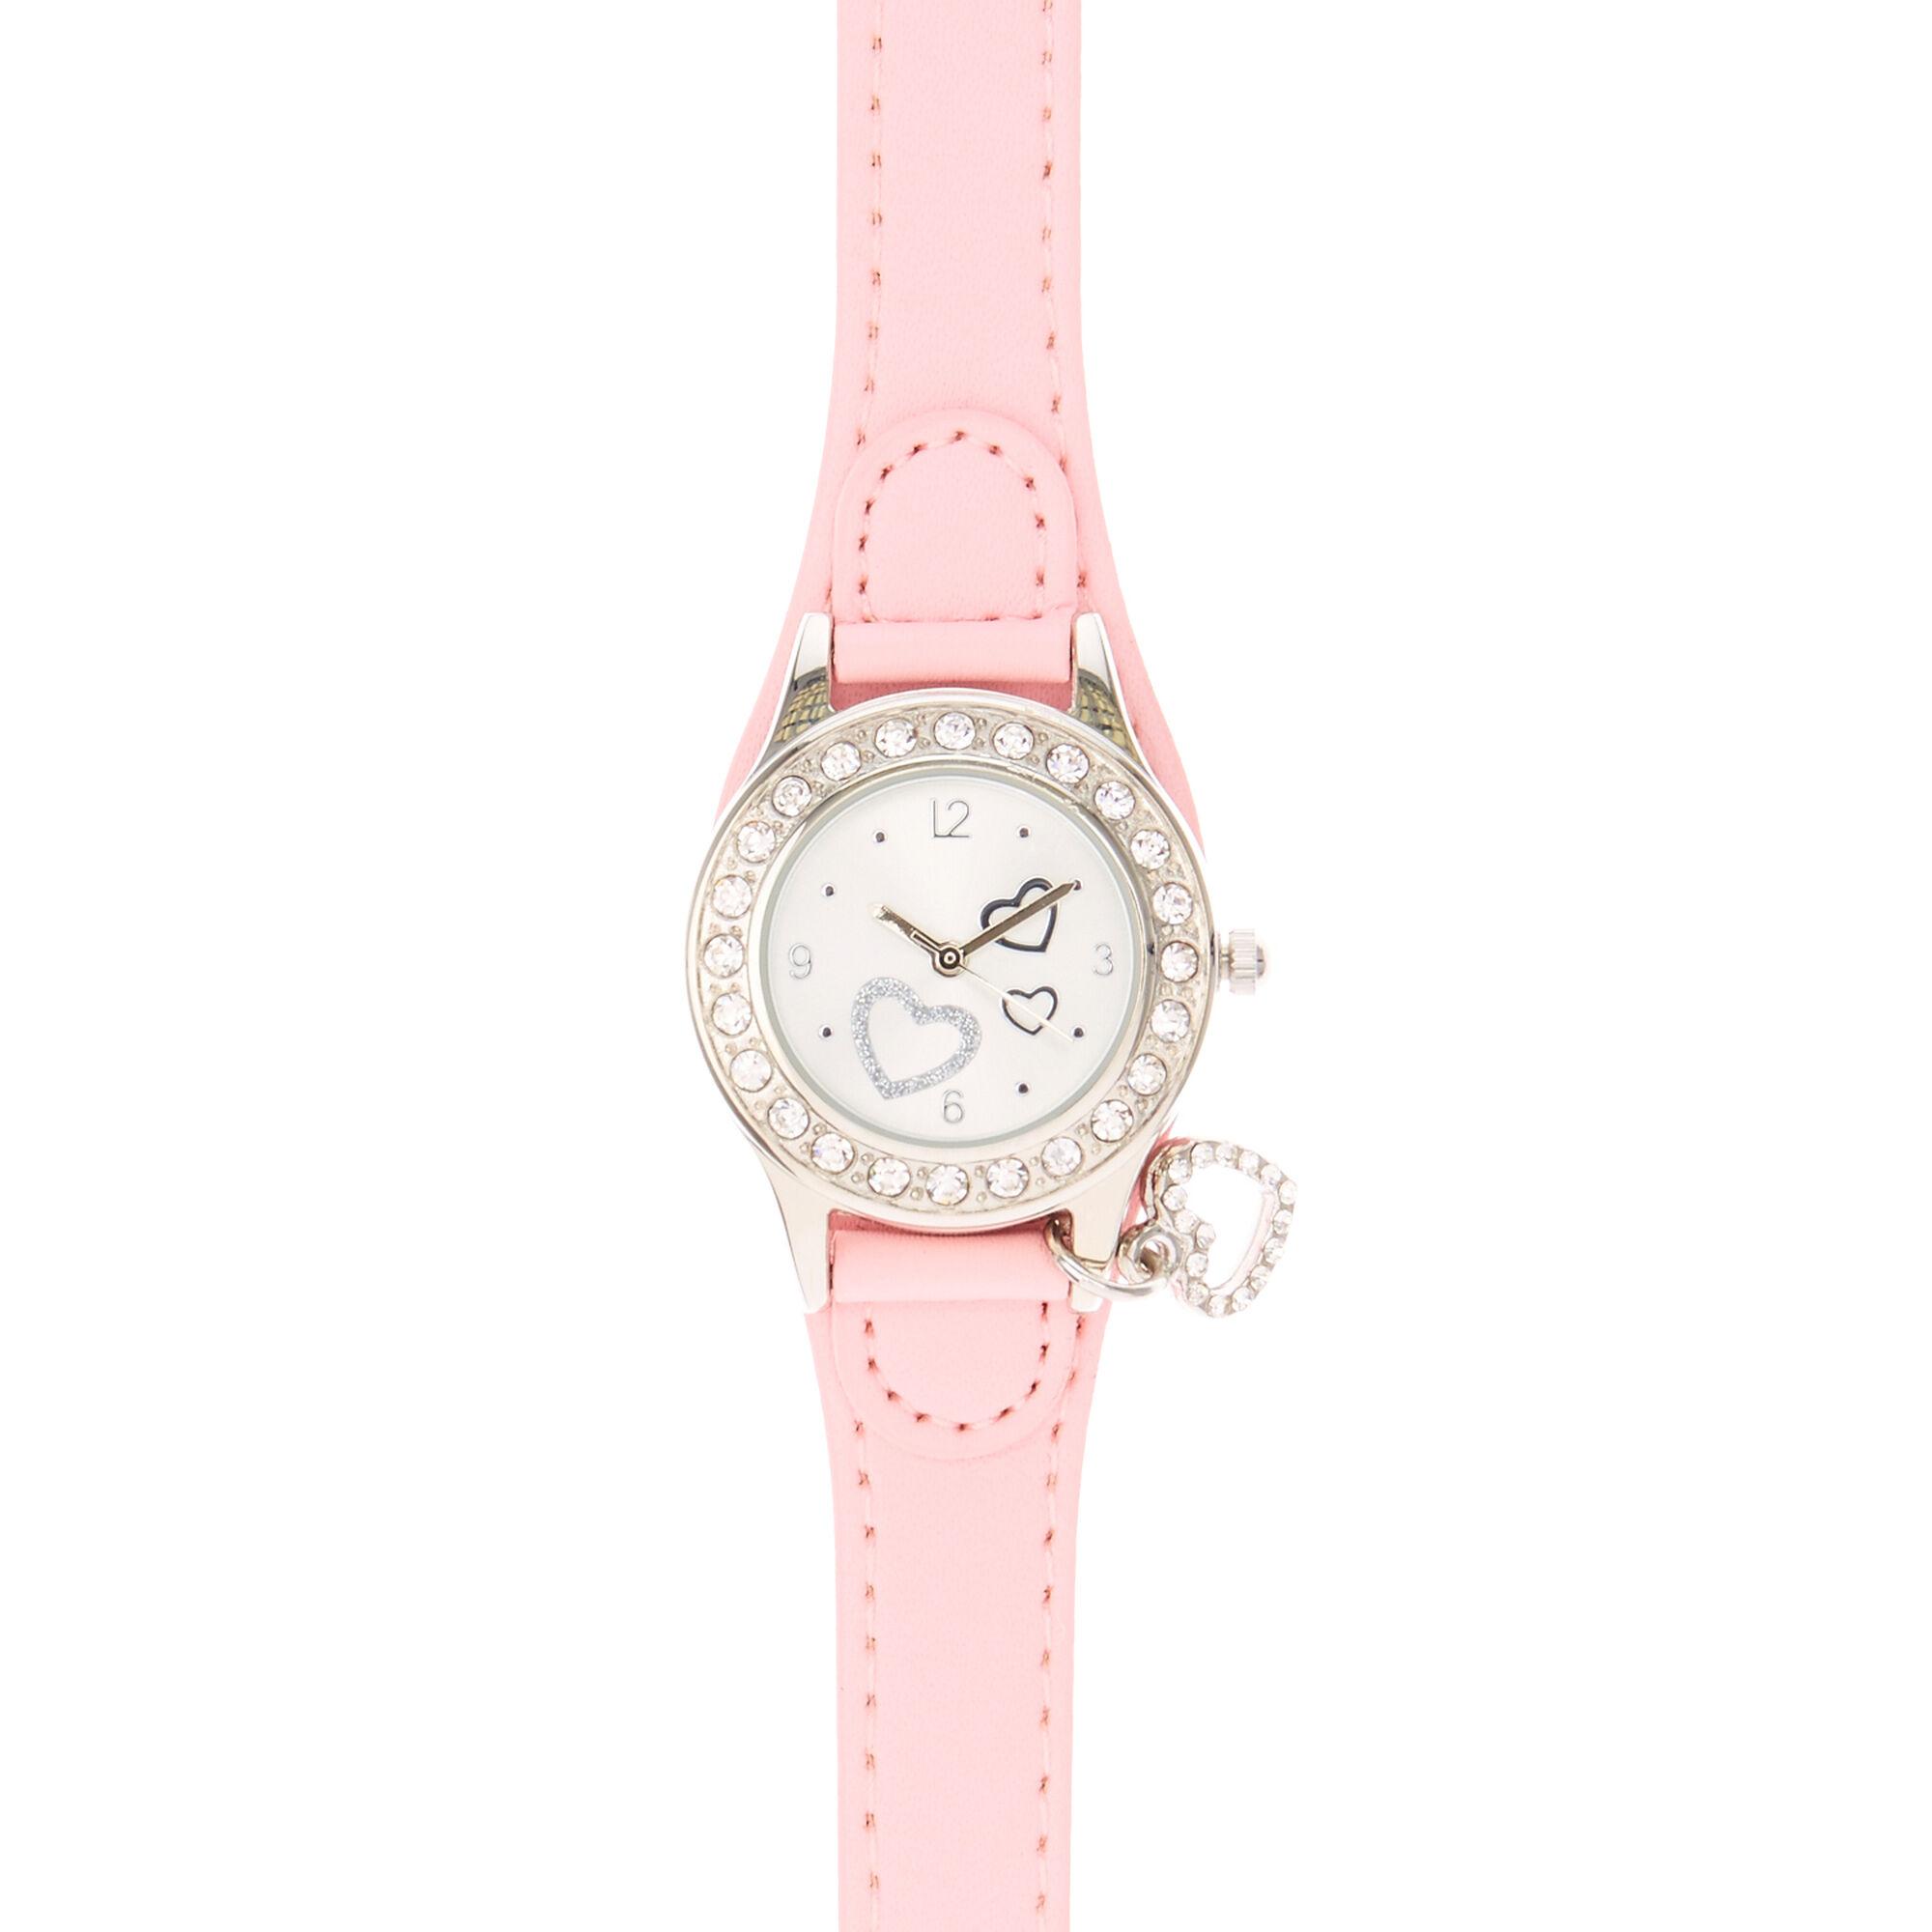 Pink Heart Charm Wrist Watch